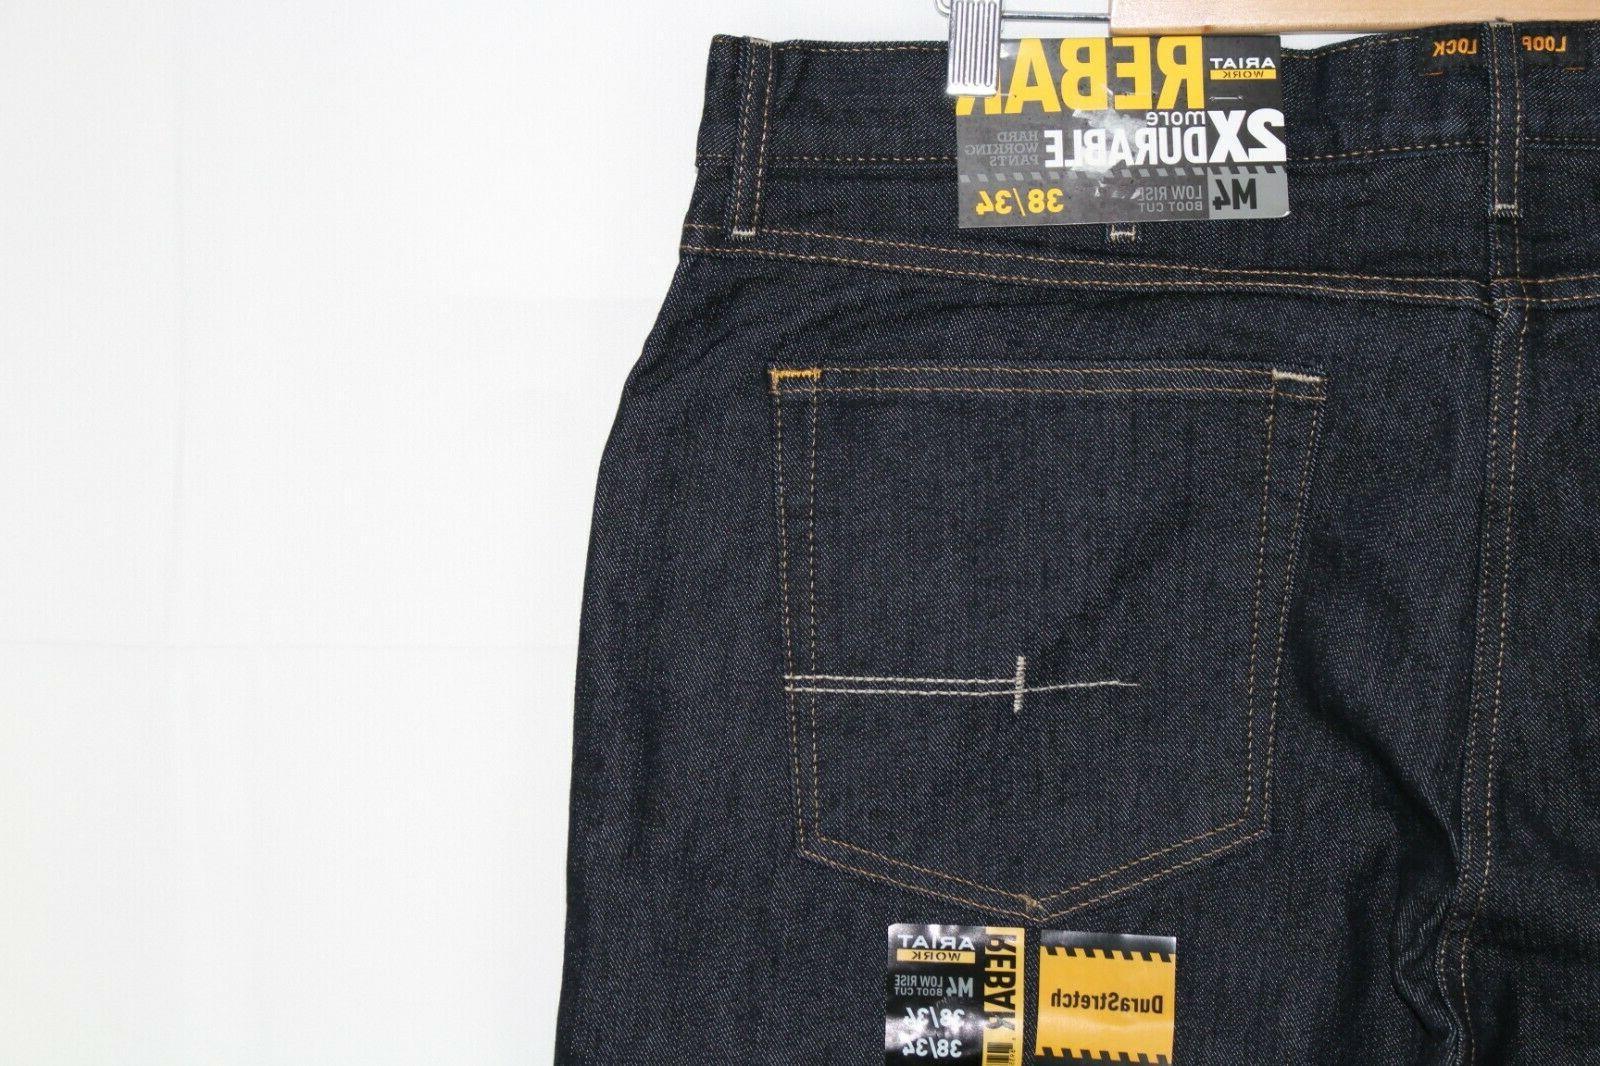 Ariat Durastretch Low Work Jeans Rinse